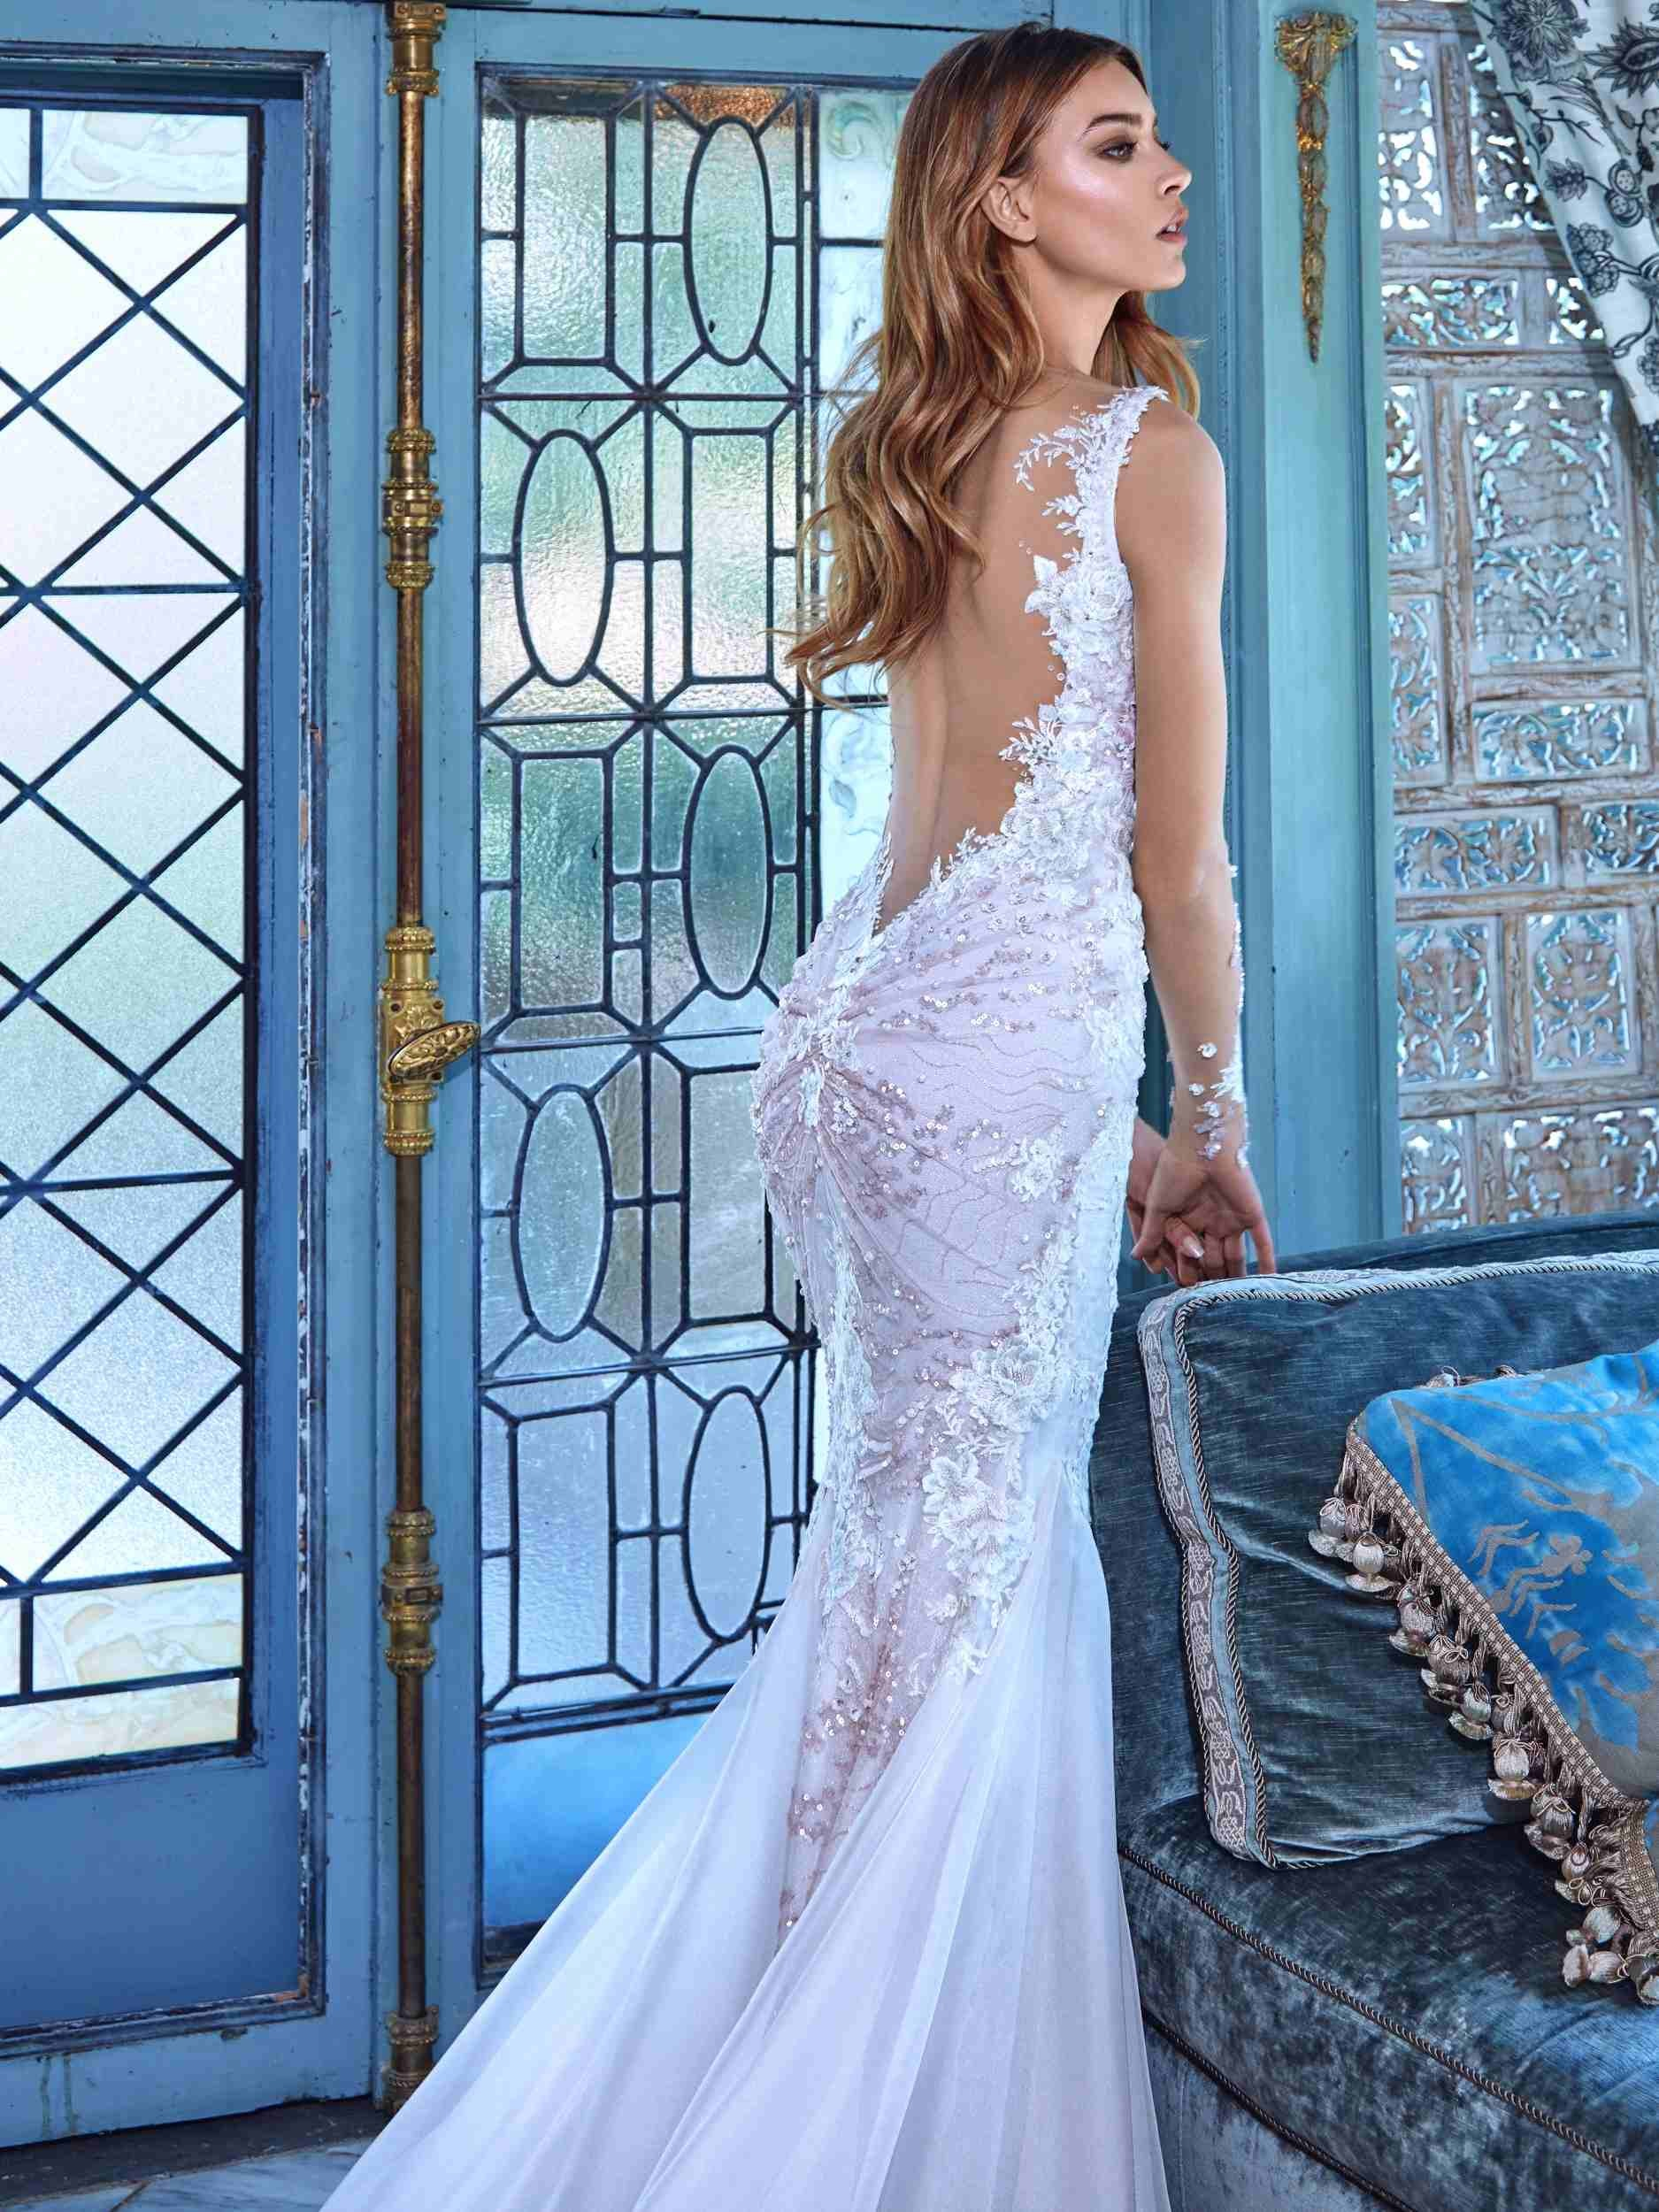 Blosses Spitze-Hochzeits-Kleid Sleeves V-Stutzen Backless Daria ...